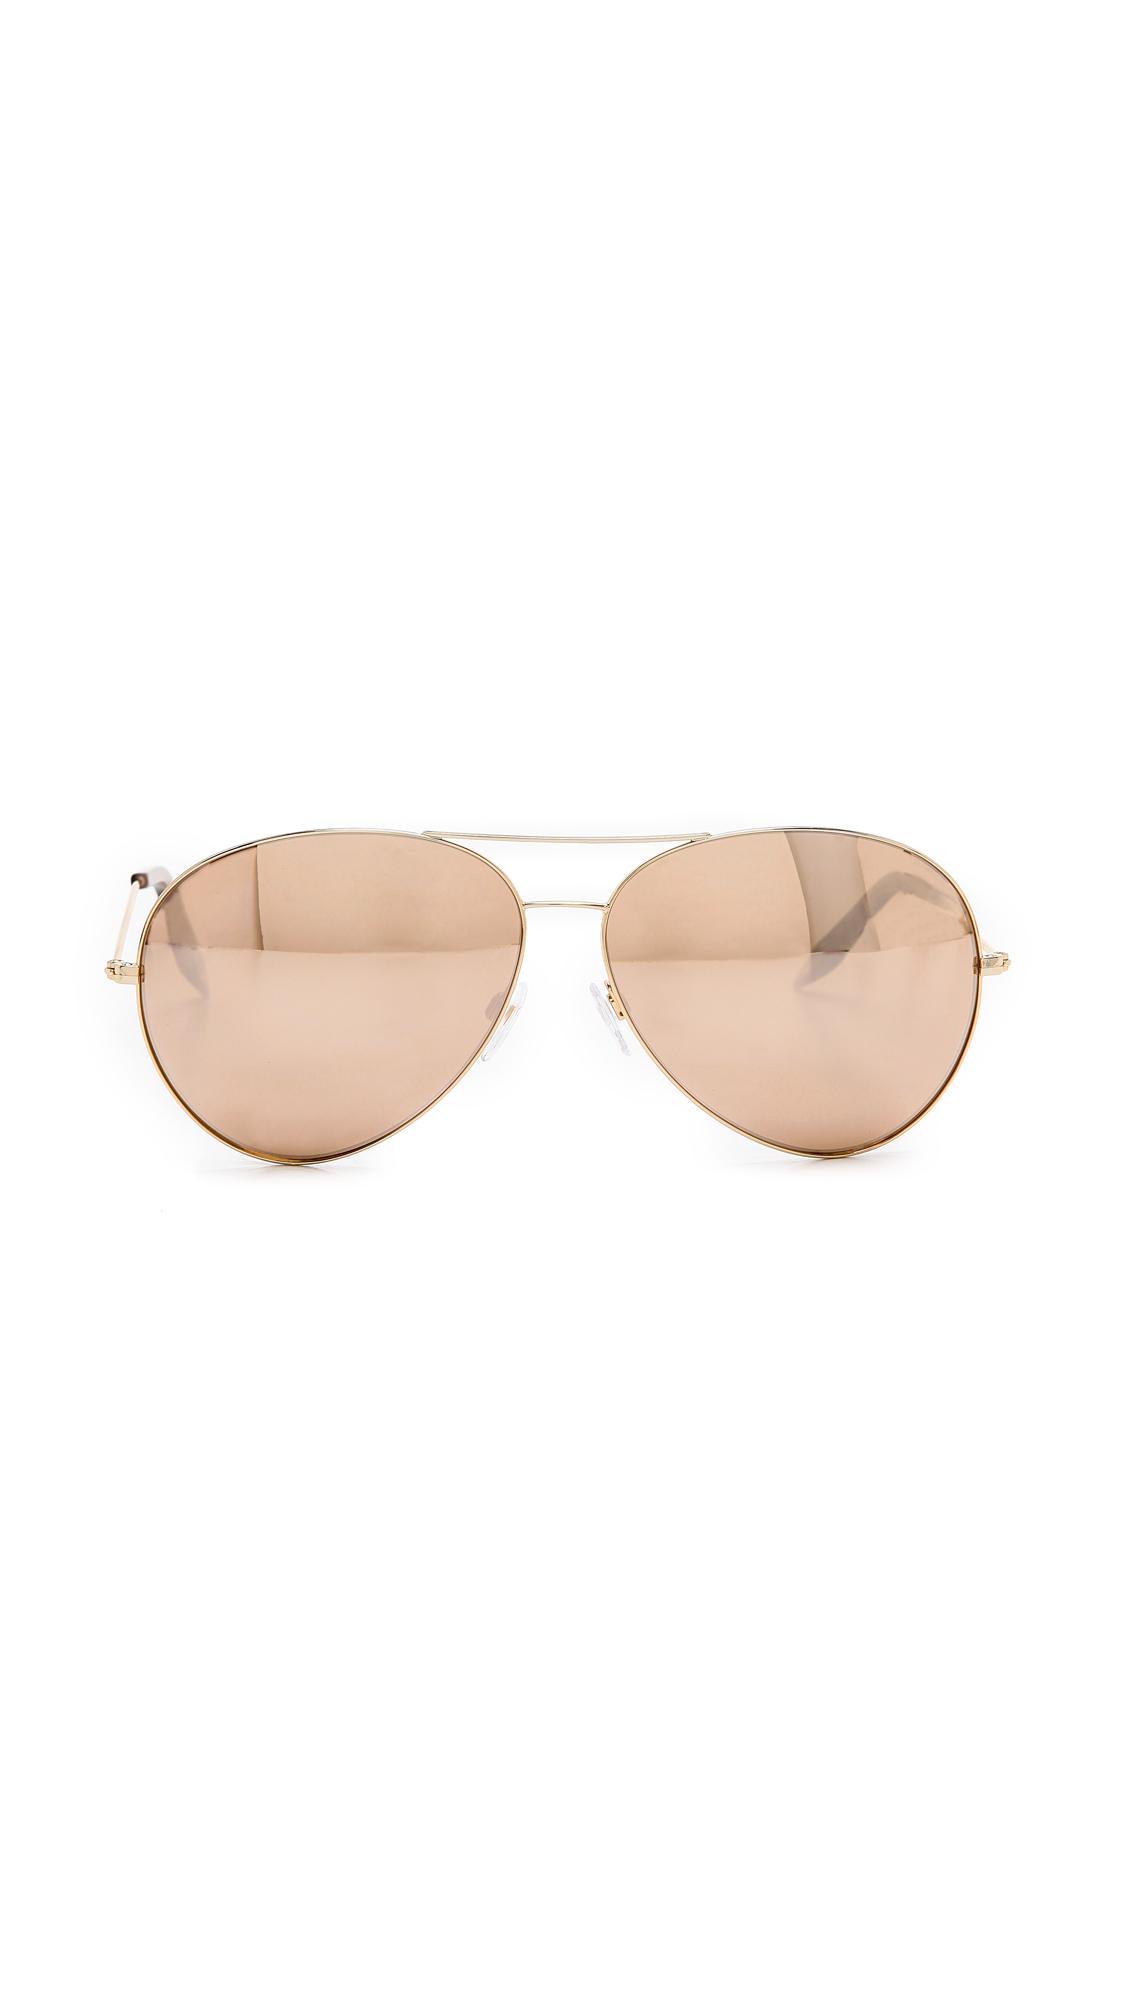 555f13ac1d Victoria Beckham 18K Gold Mirror Aviator Sunglasses - Gold Gold ...